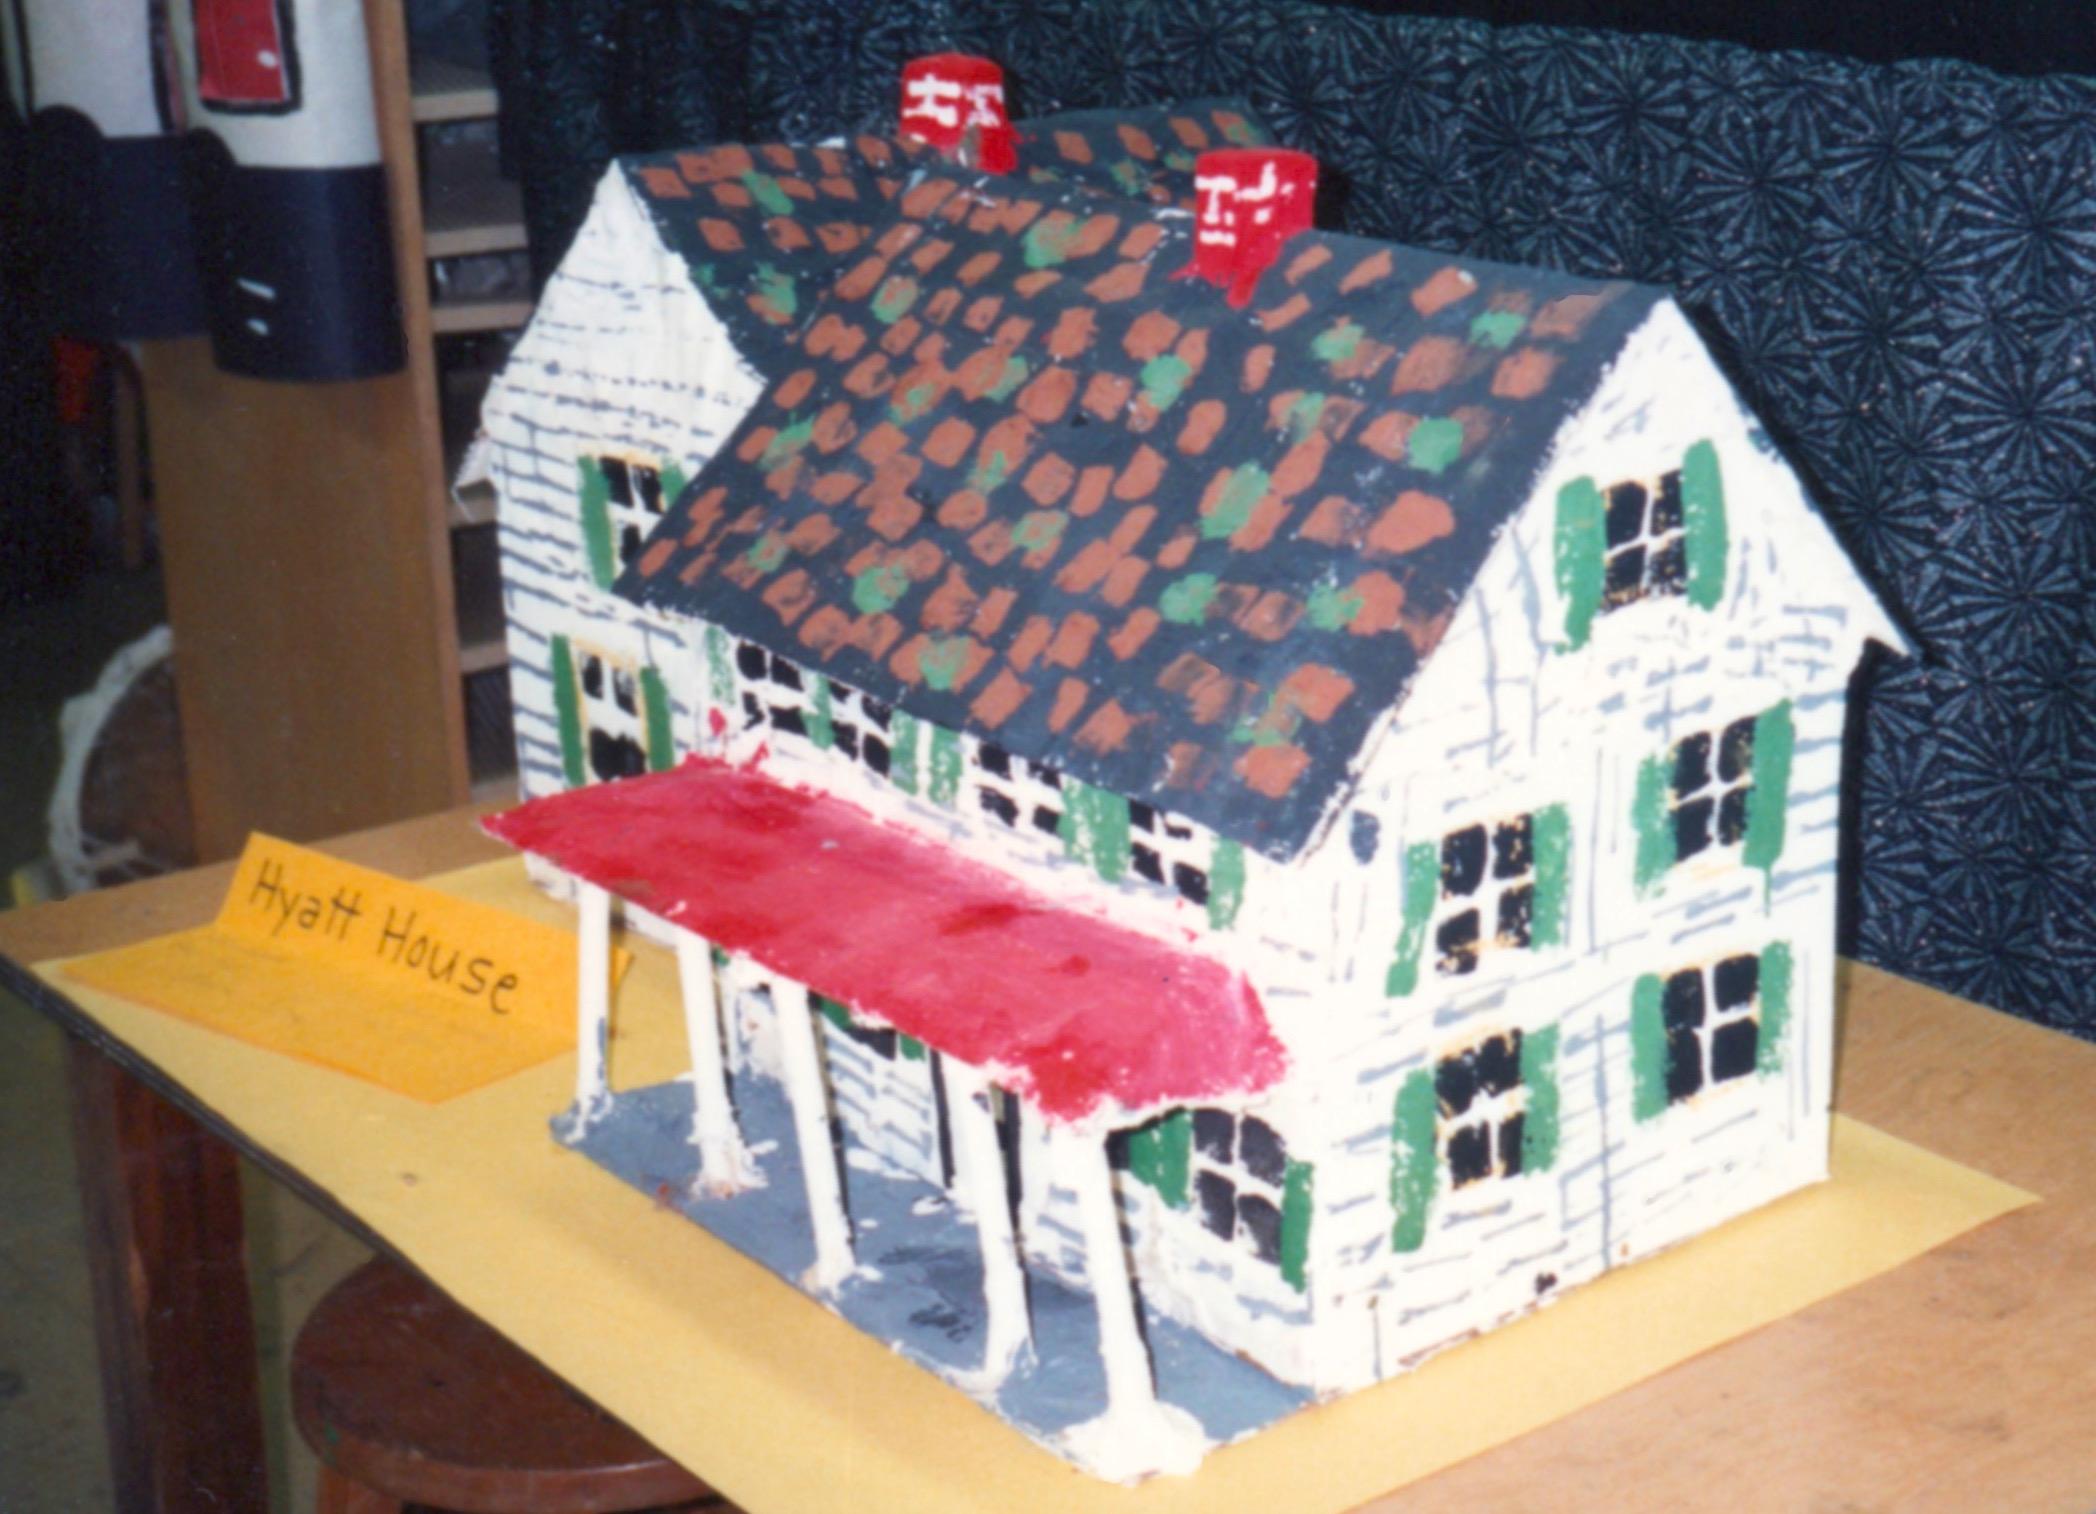 Model of the Cudner-Hyatt House made by schoolchildren.